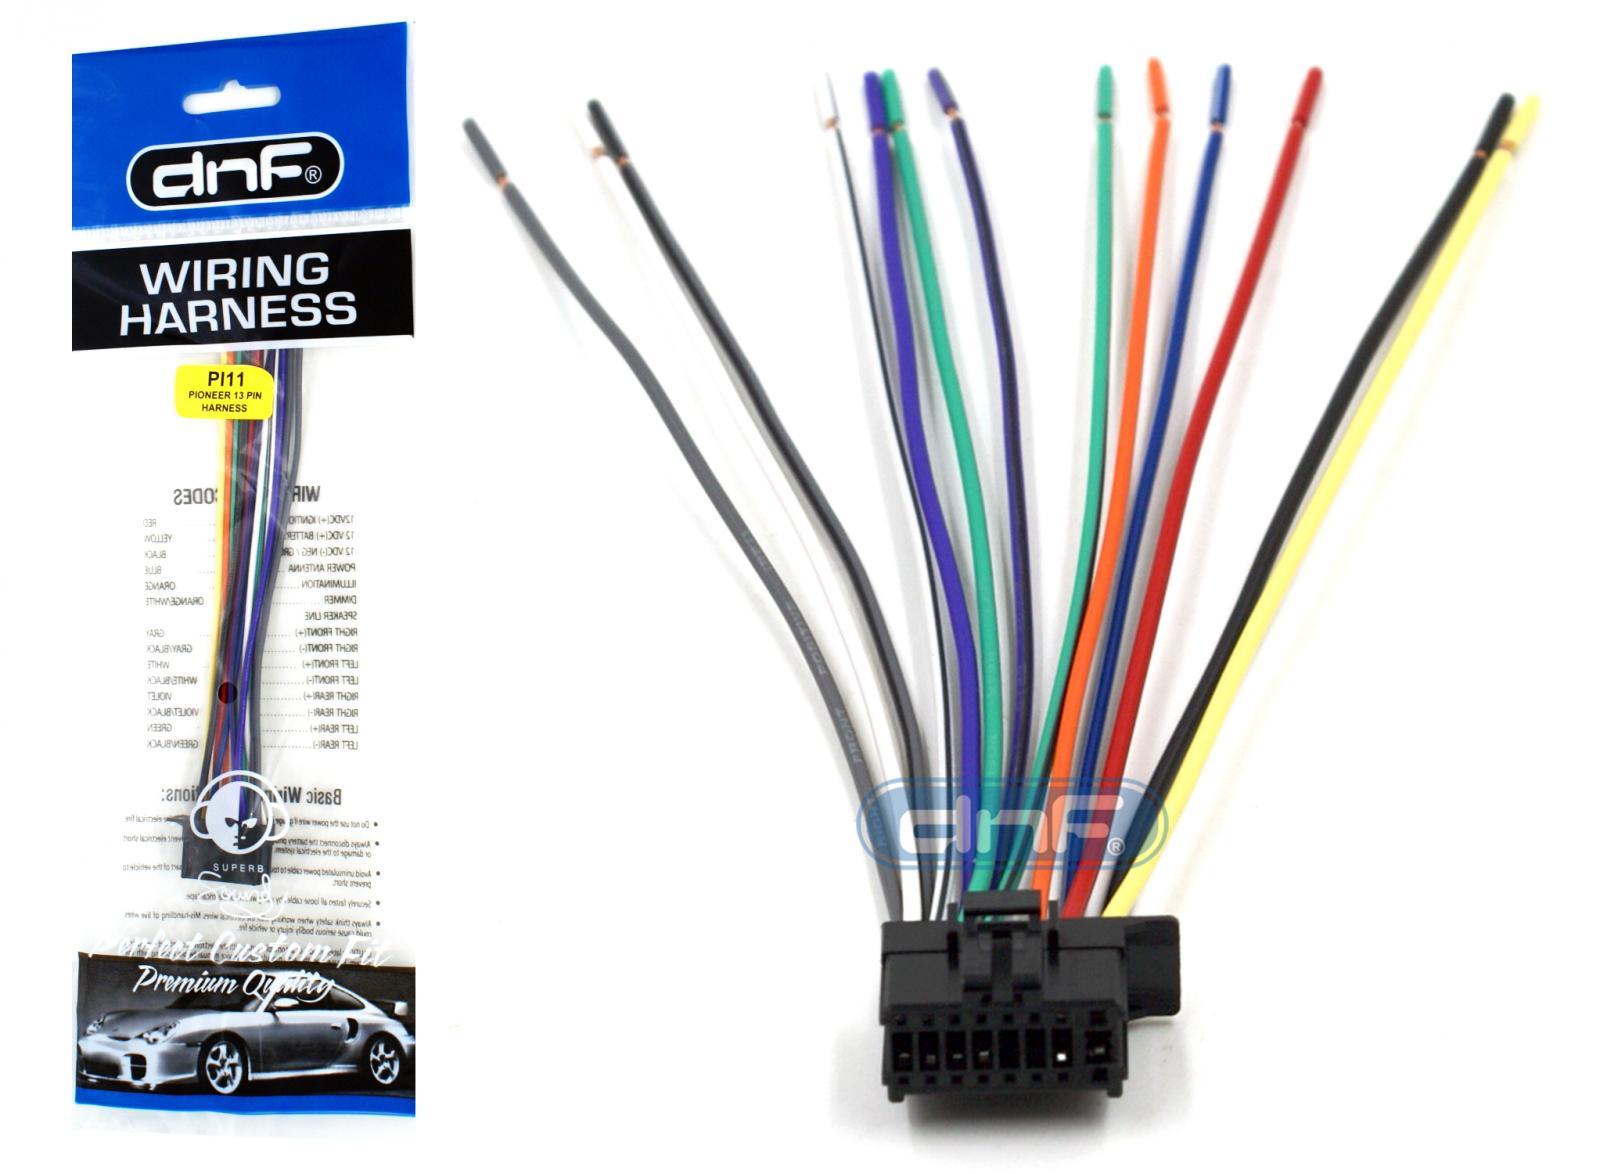 pioneer deh p5200hd deh p6200bt dxt 2266ub wiring harness ships rh ebay com